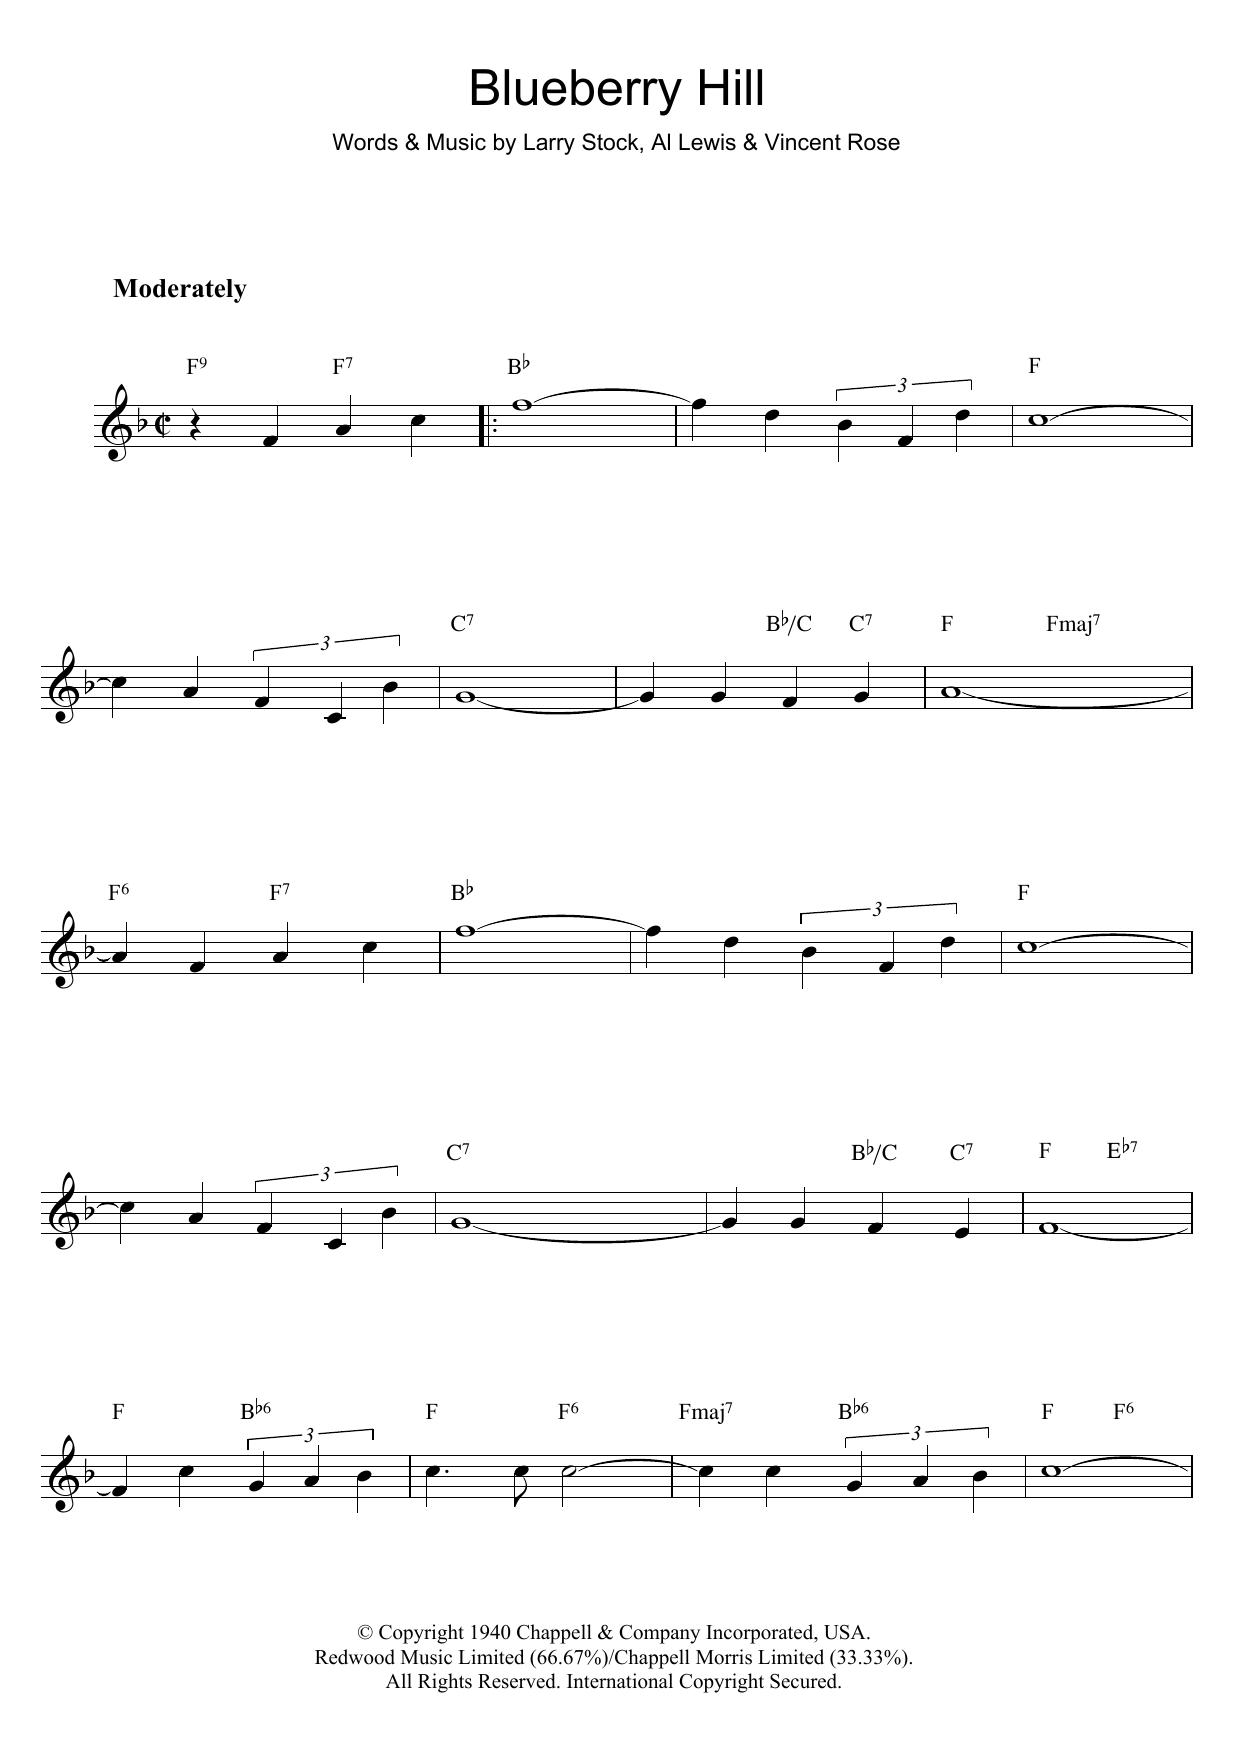 Blueberry hill sheet music direct sheet preview blueberry hill hexwebz Images